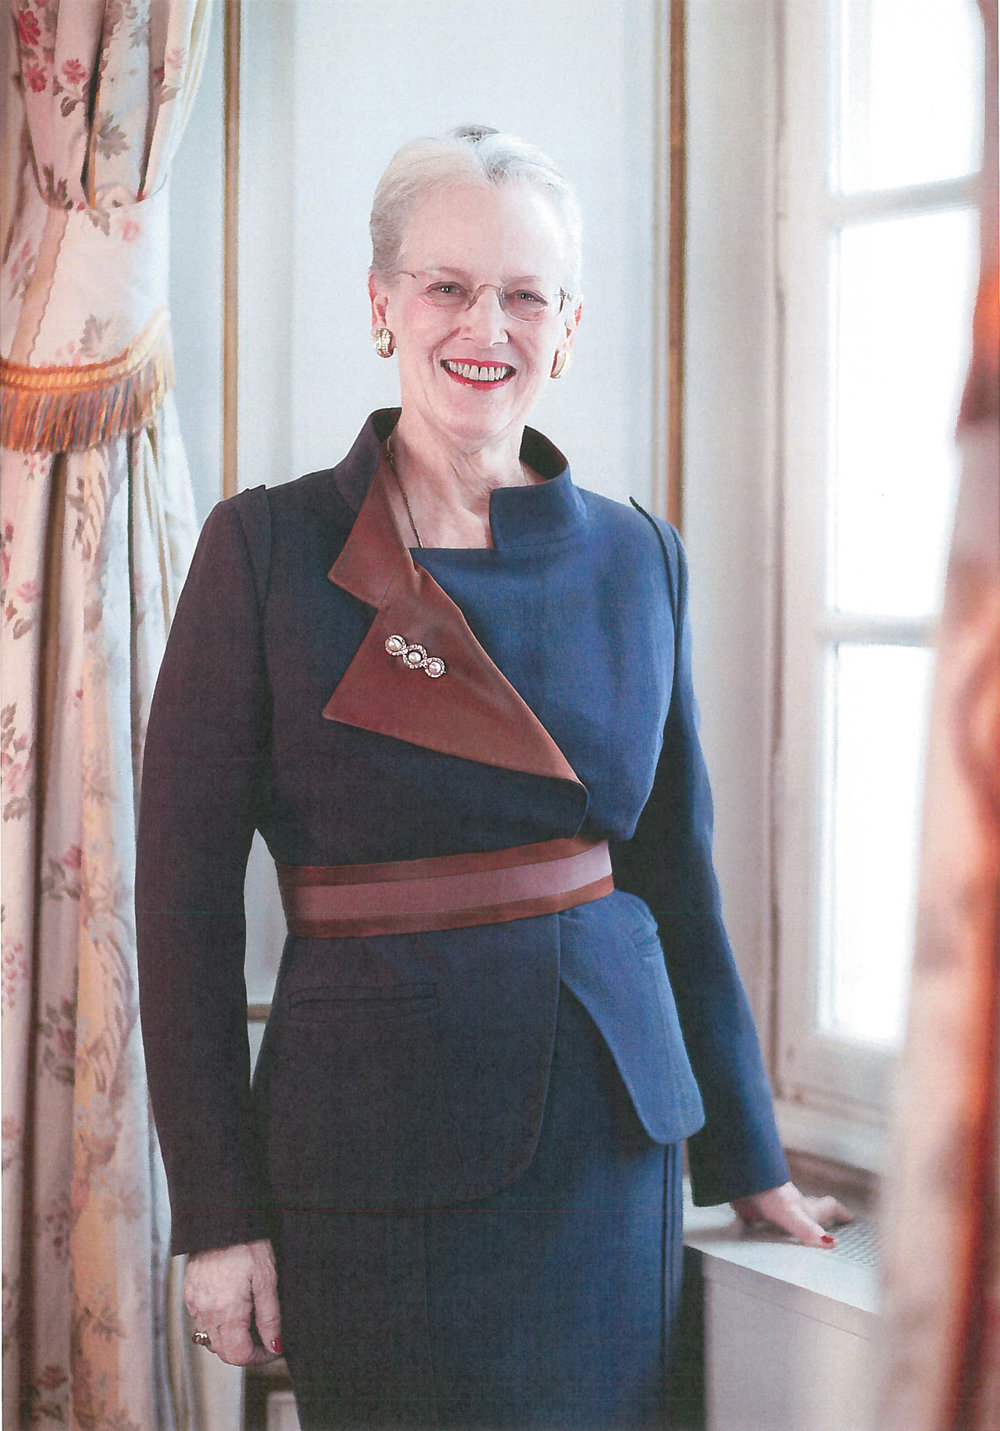 Her Majesty Queen Margrethe II of Denmark